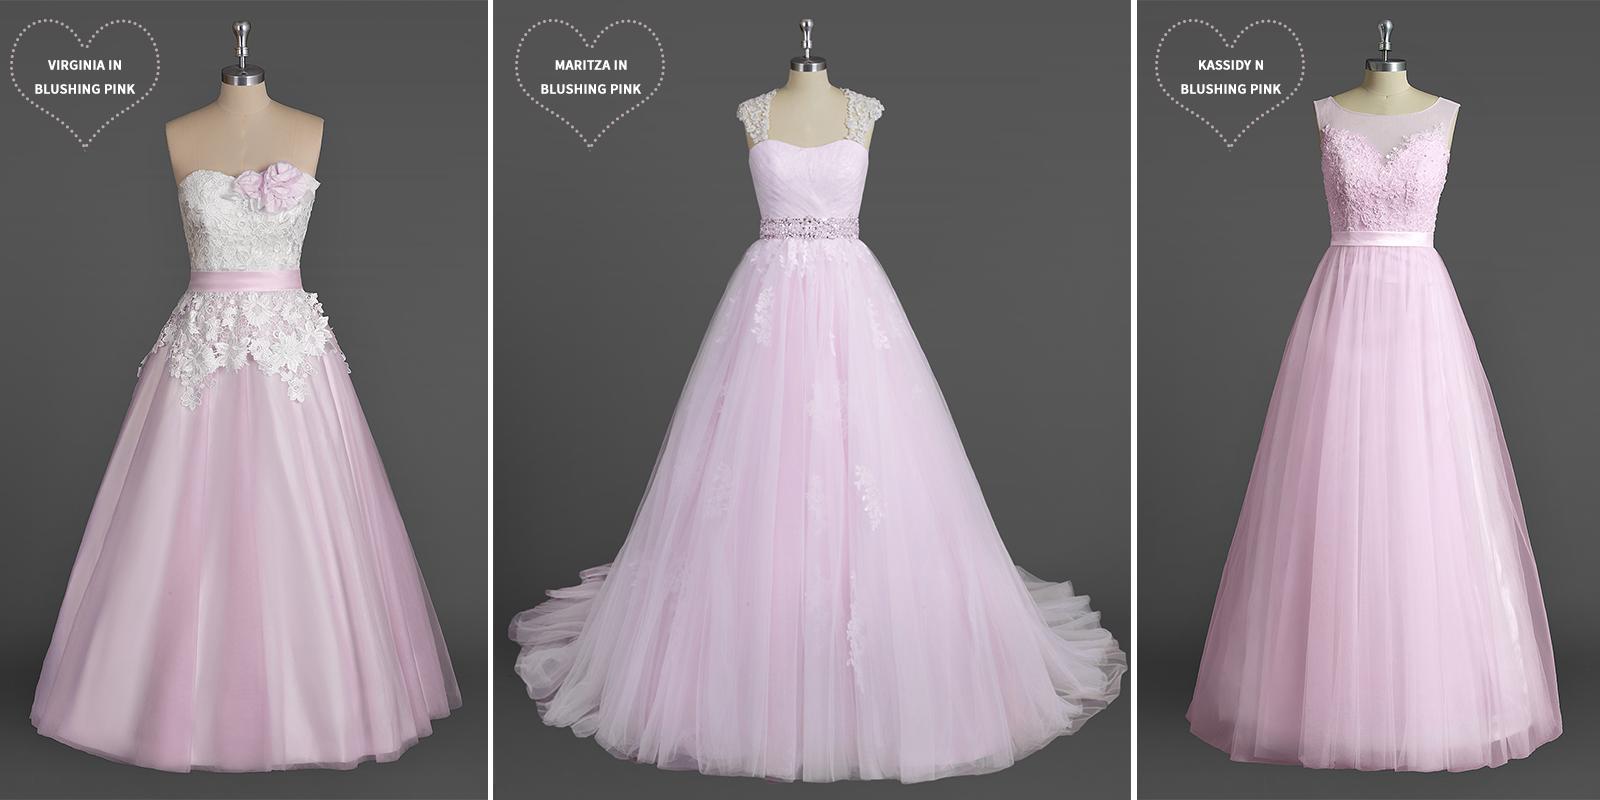 AZAZIE_Blushing_Pink_Bridesmaid_Dresses